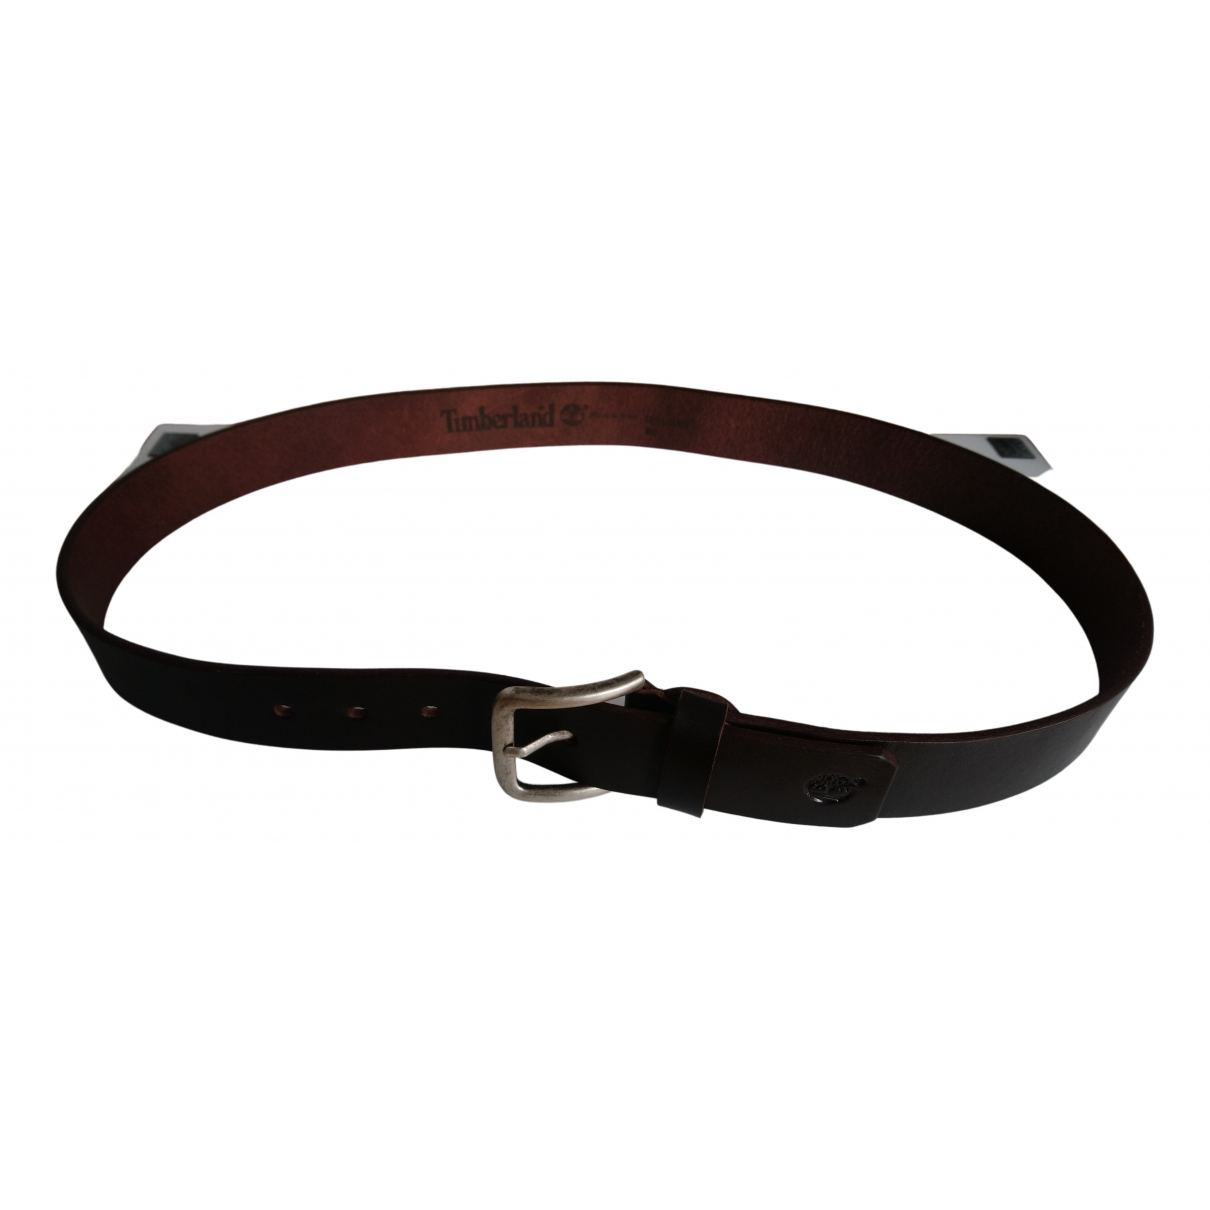 Timberland N Brown Leather belt for Men 100 cm